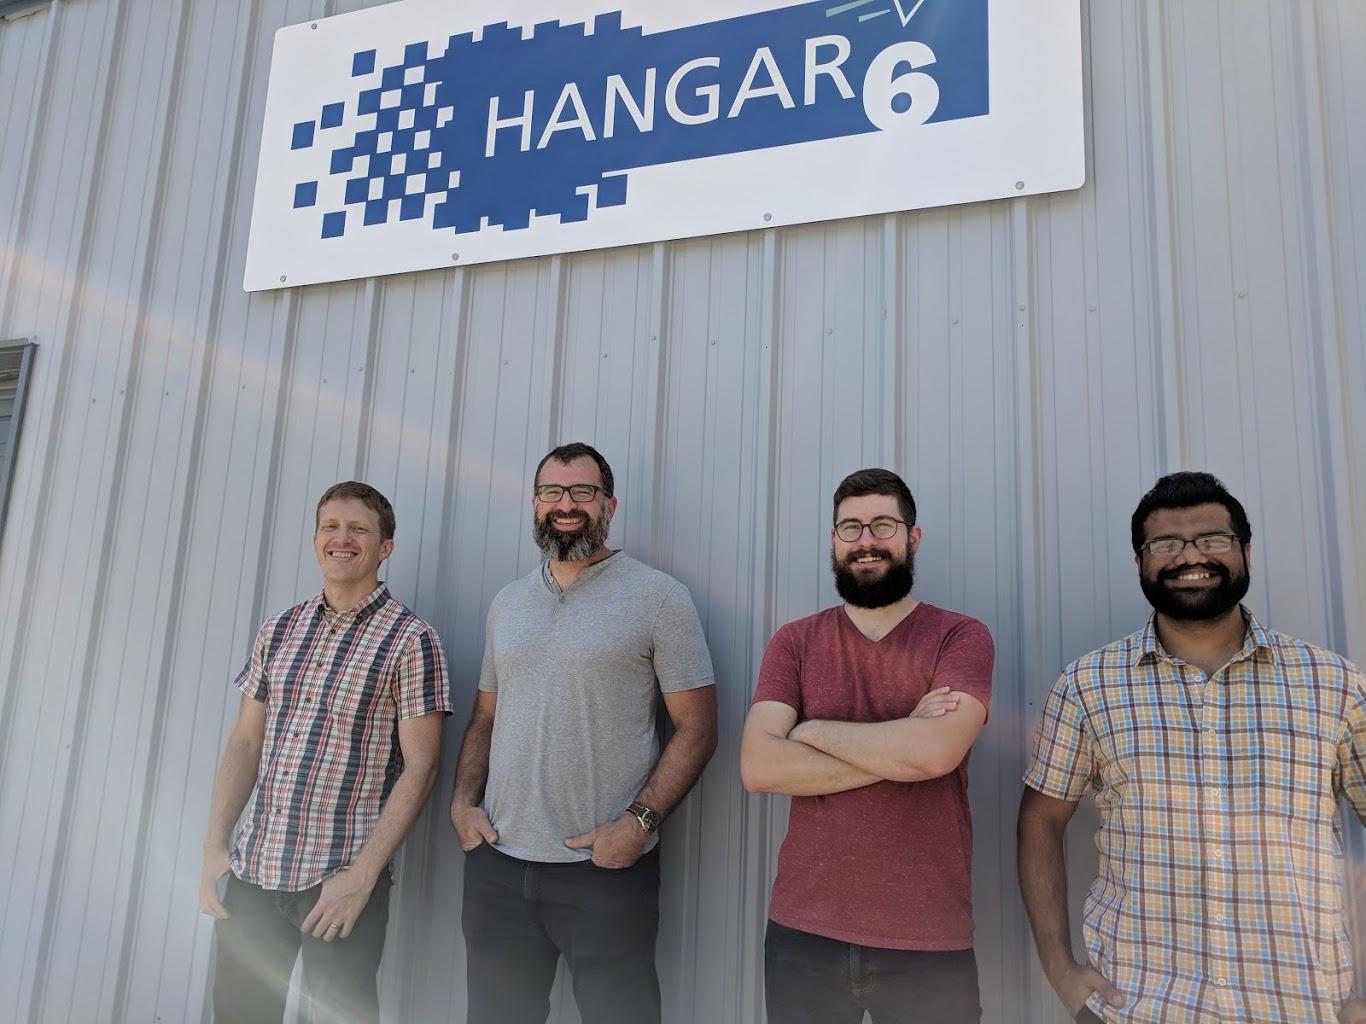 Trig-Team-Hangar6-Sponsor-Group